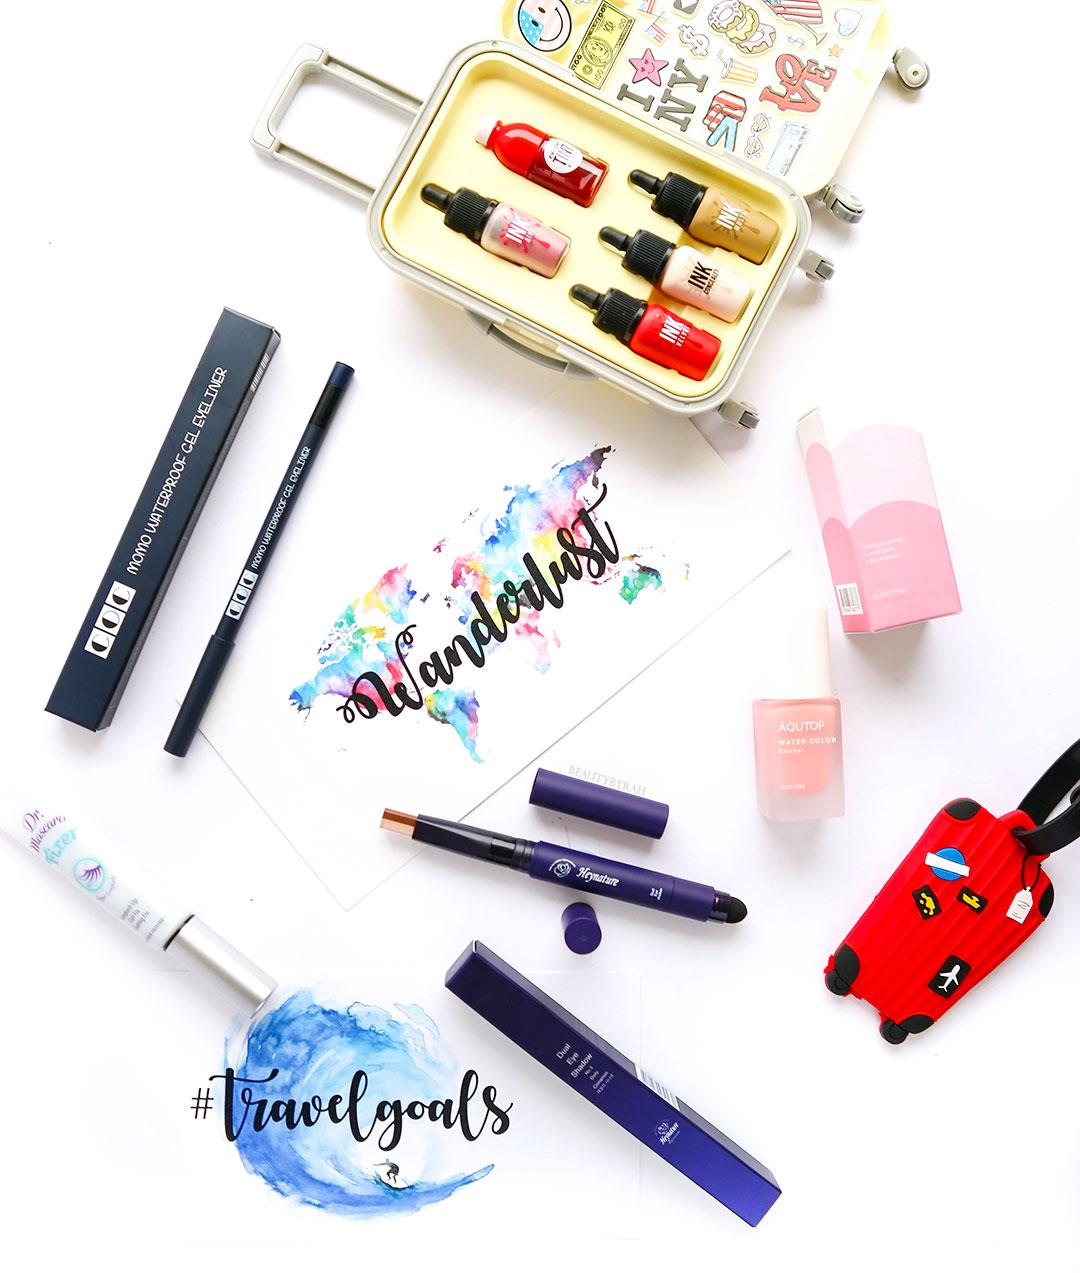 Althea Korea Wanderlust Beauty Box Review